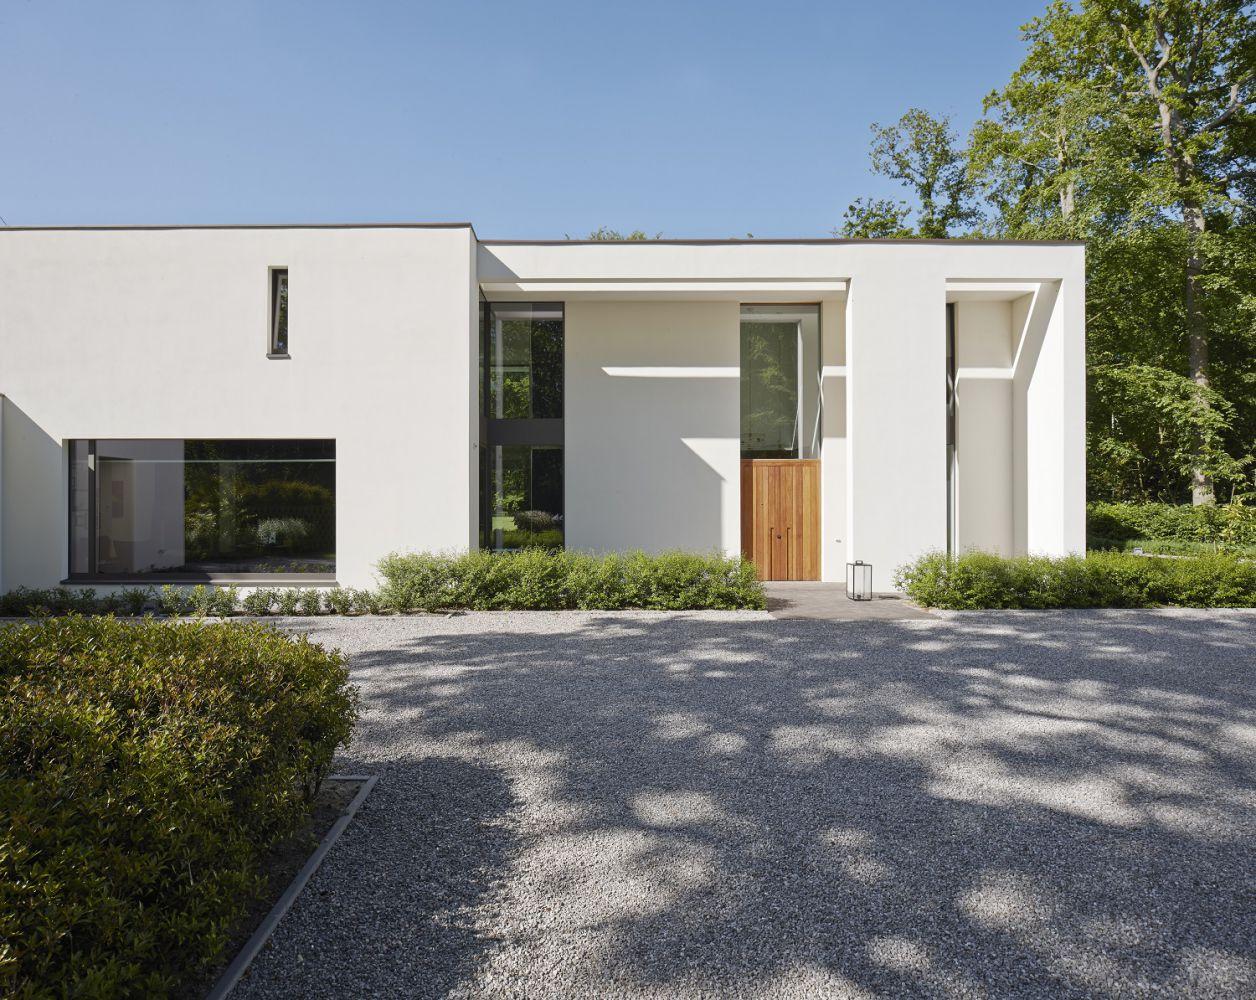 Architecture | Exclusive villa construction Vlassak Verhulst